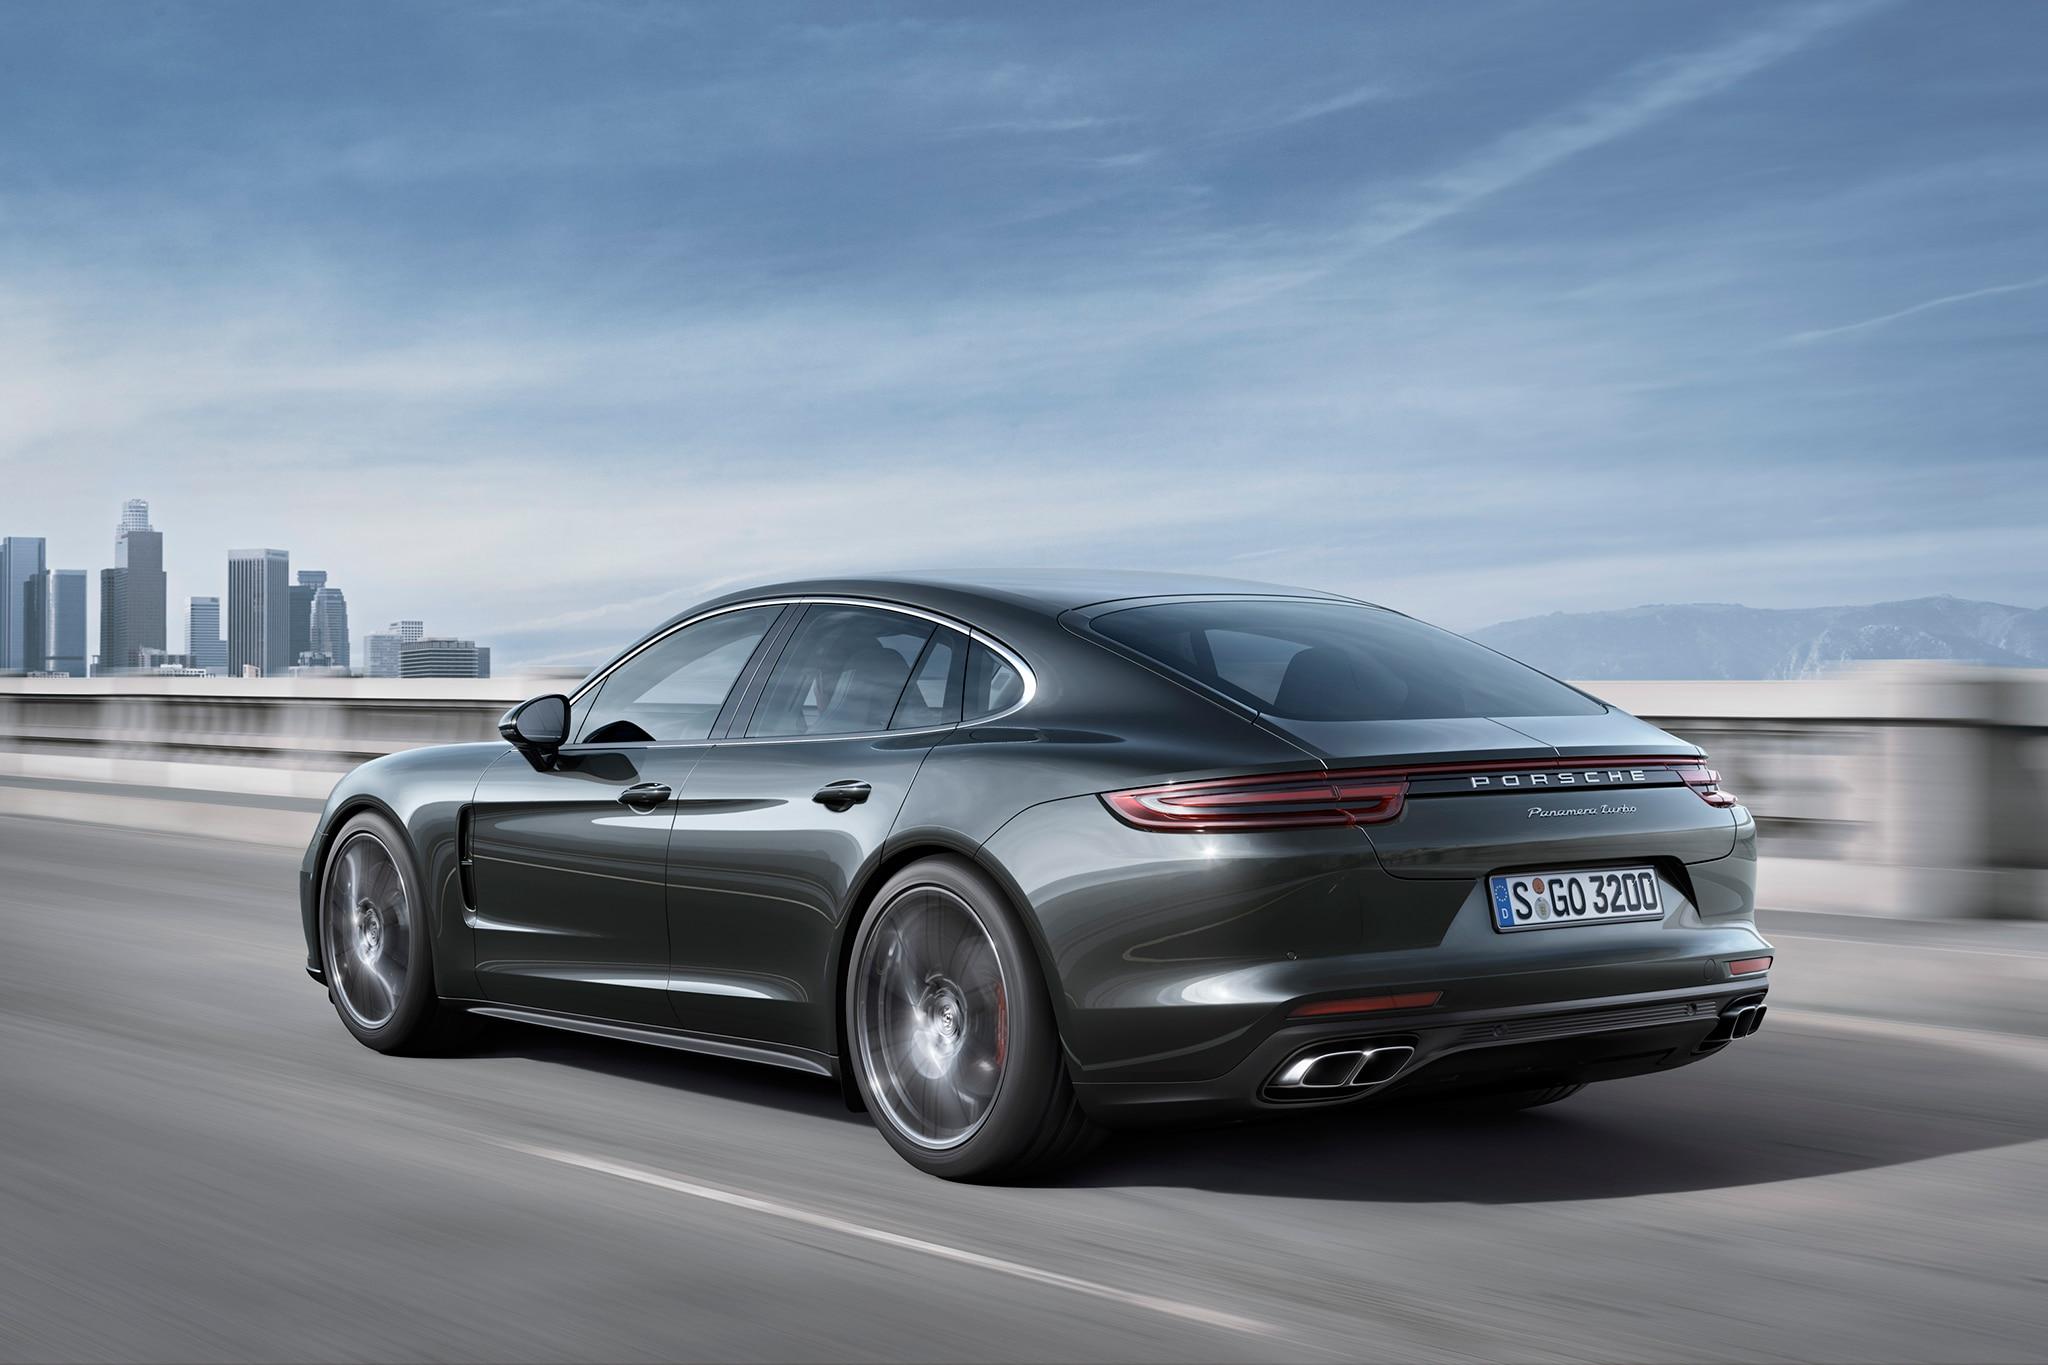 The Key Technologies Inside the 2017 Porsche Panamera Turbo